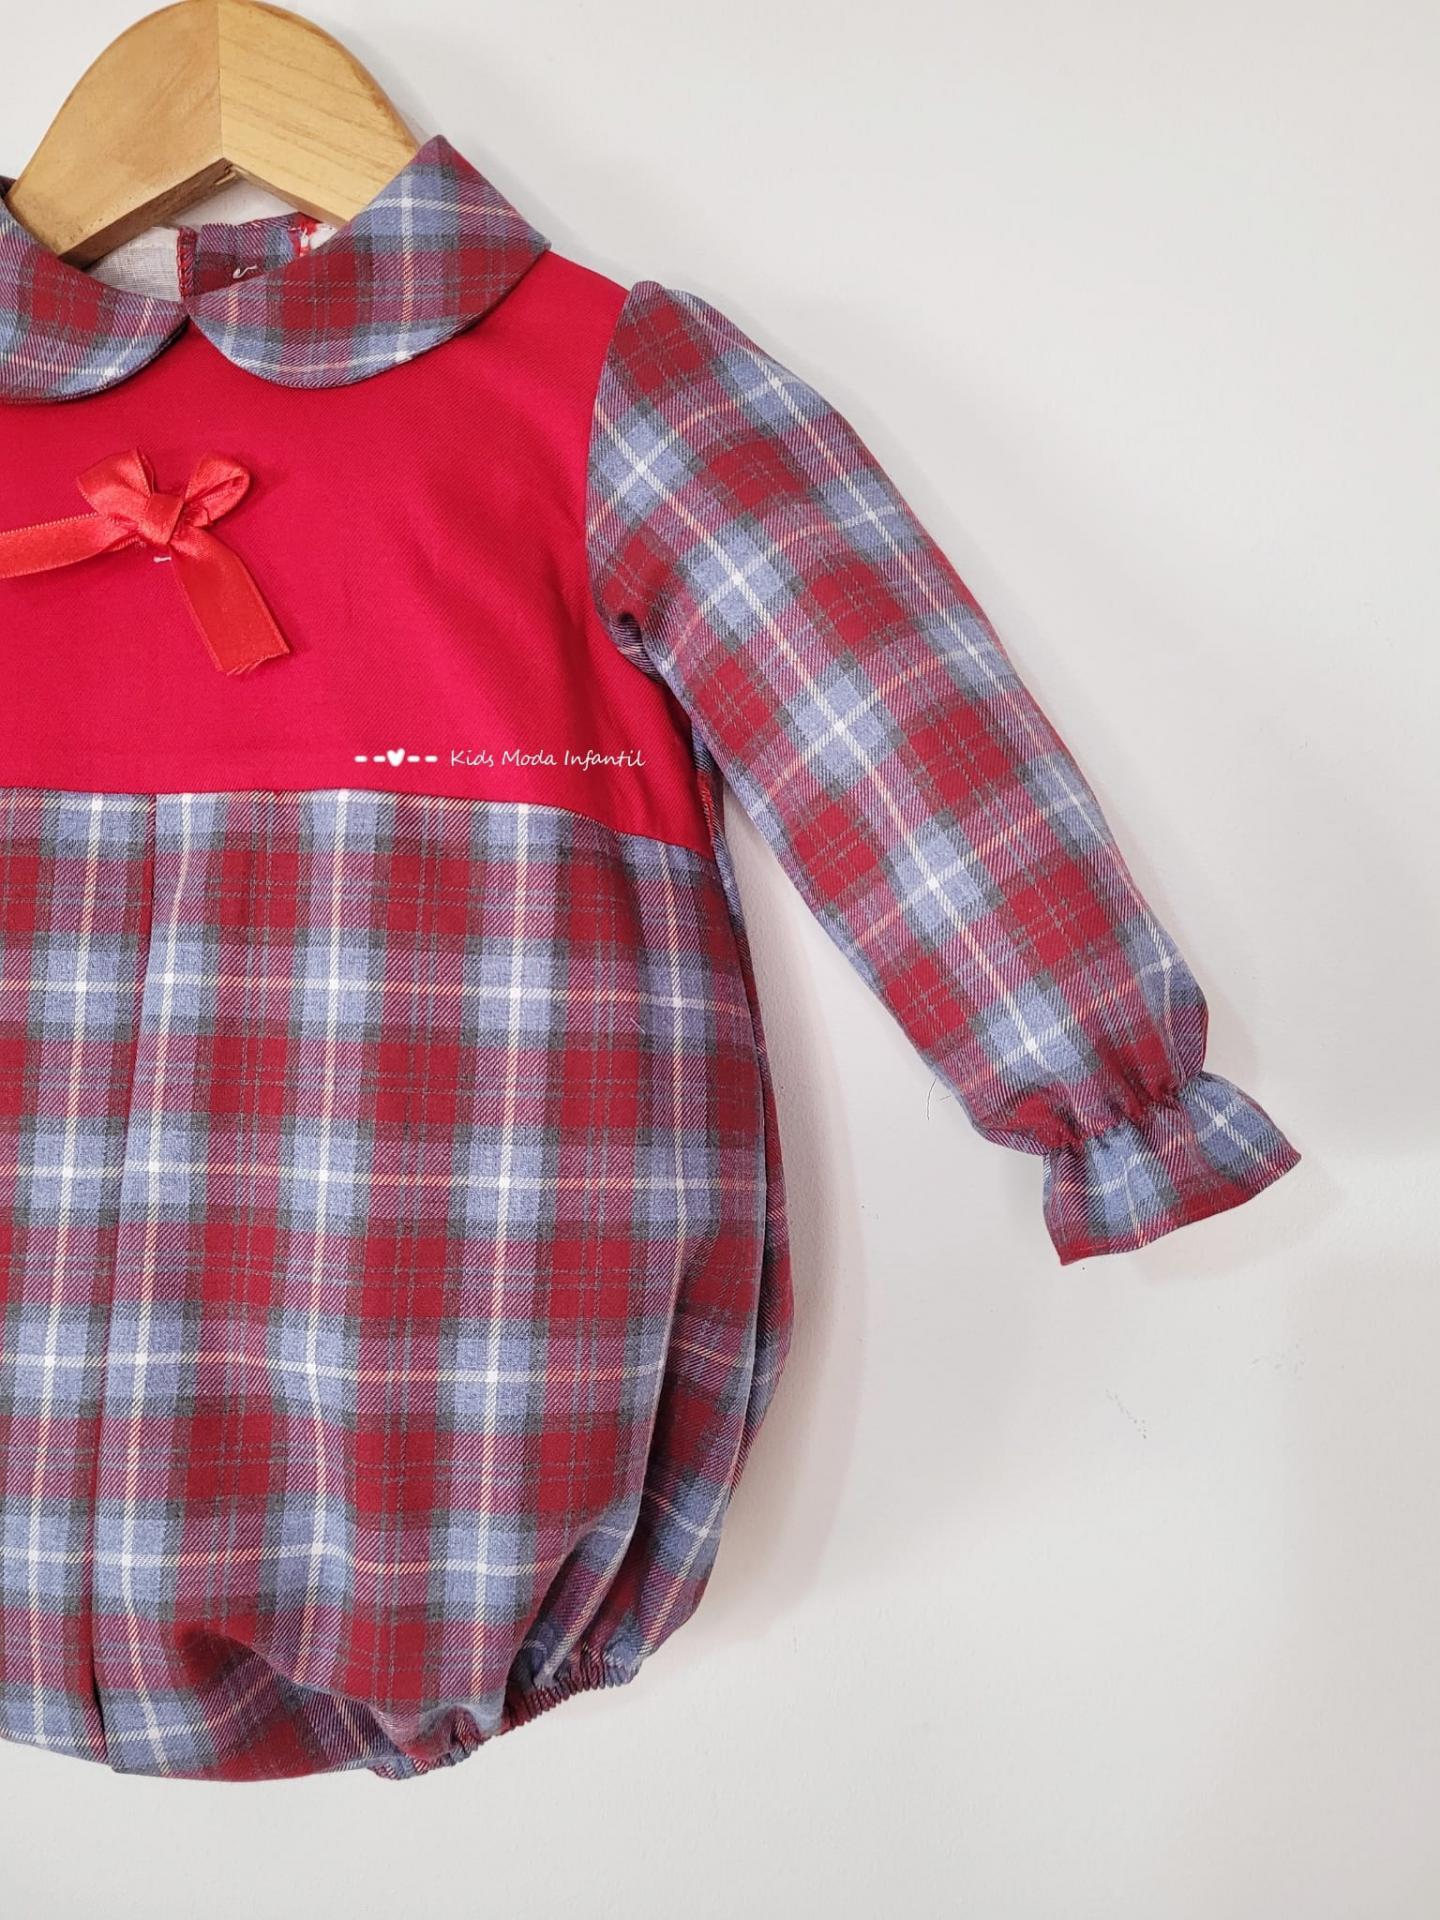 Pelele bebe rojo de cuadros estampados de Eva Class